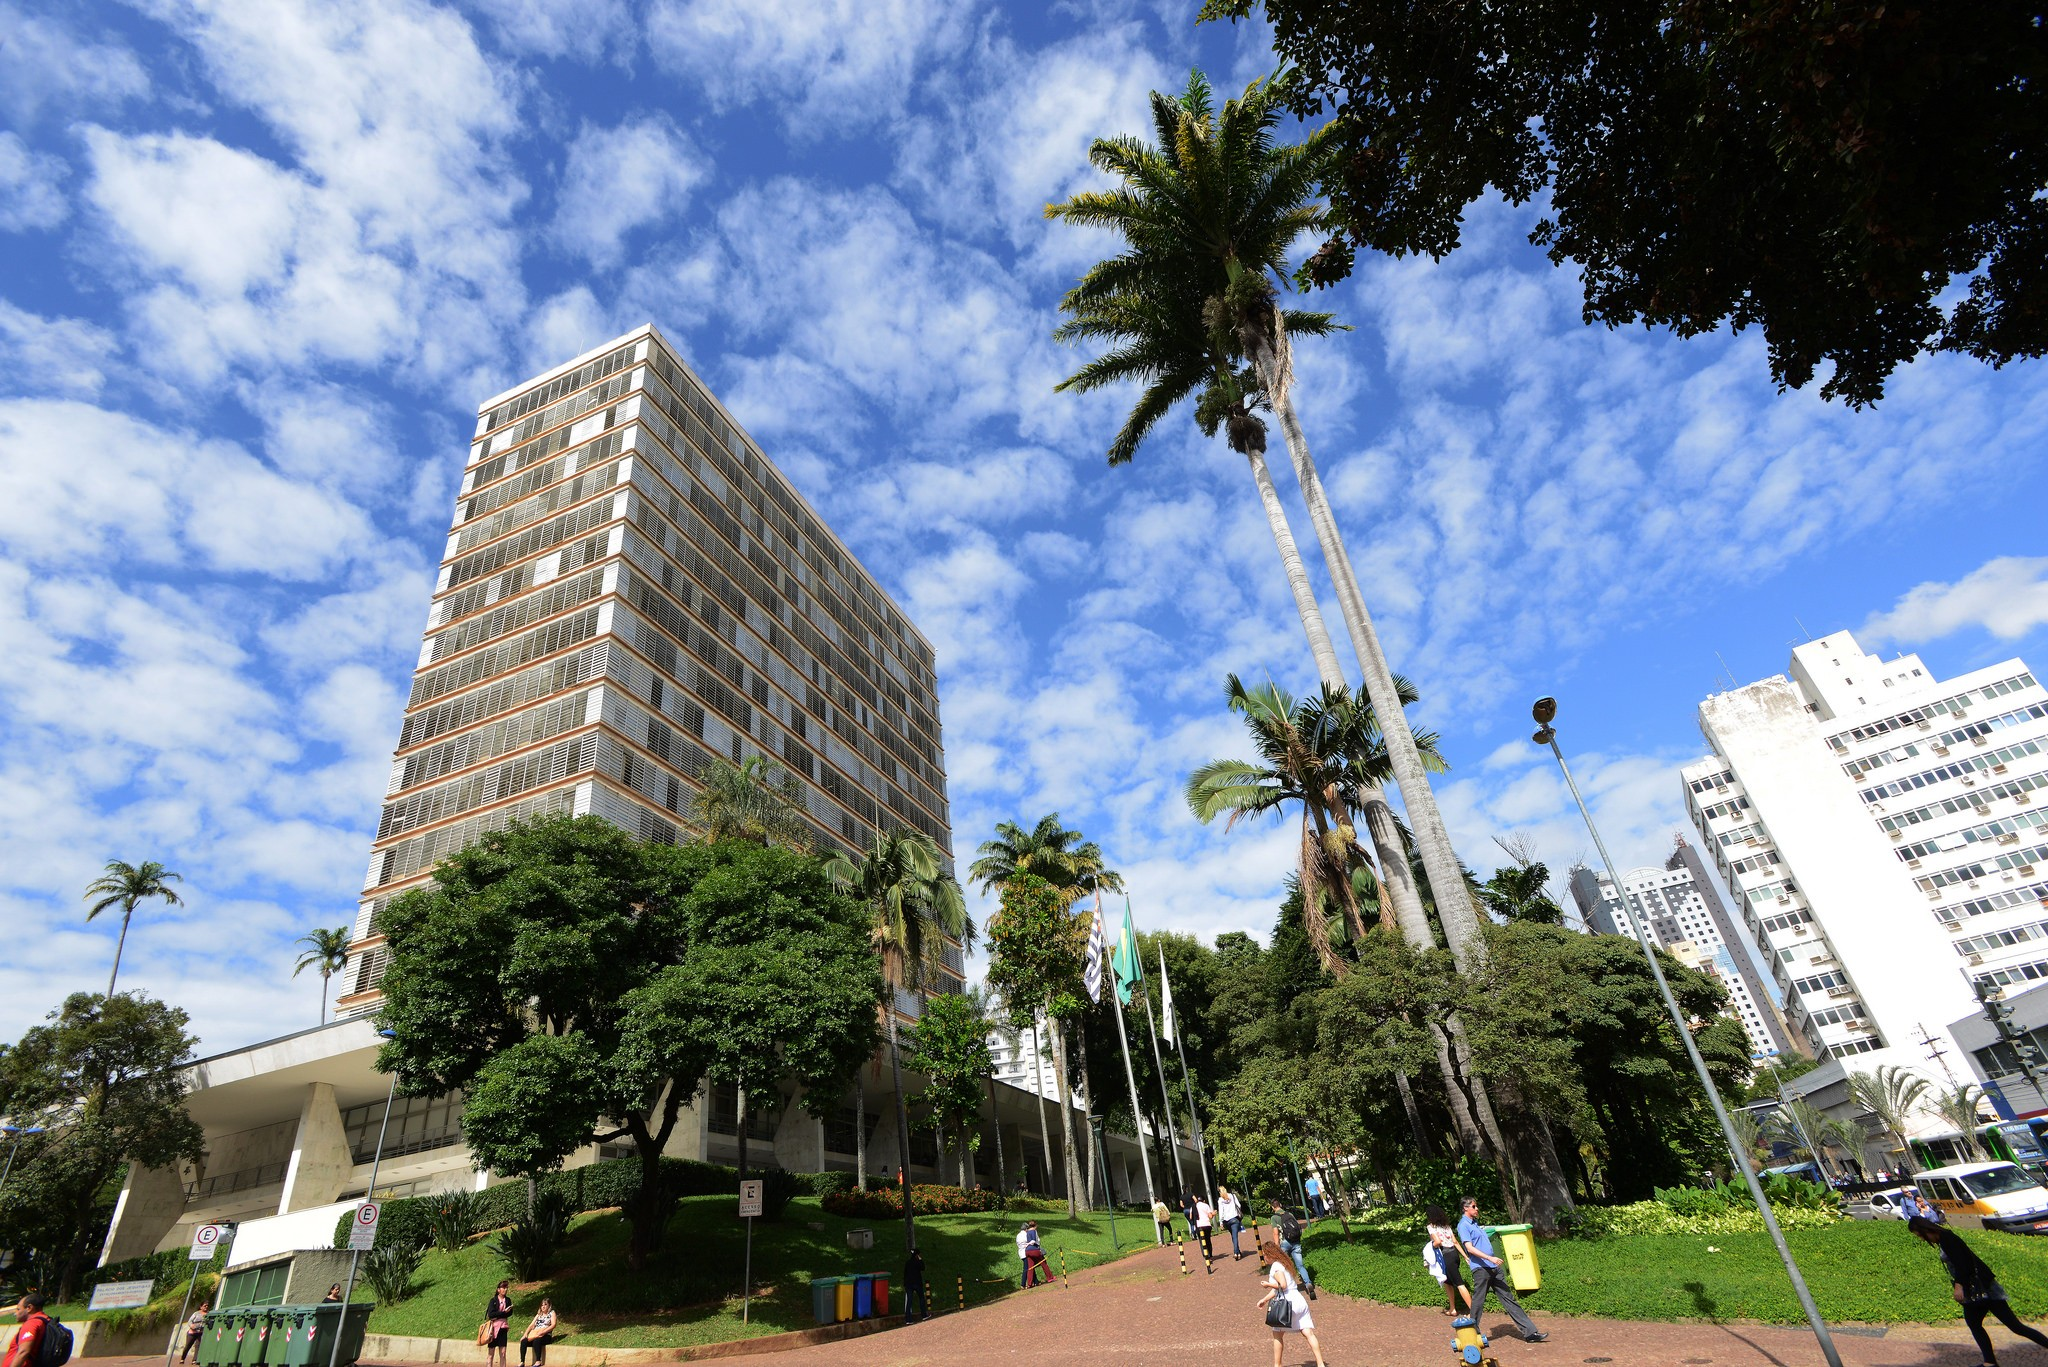 Prefeitura de Campinas realiza palestra gratuita sobre comércio exterior  - Noticias